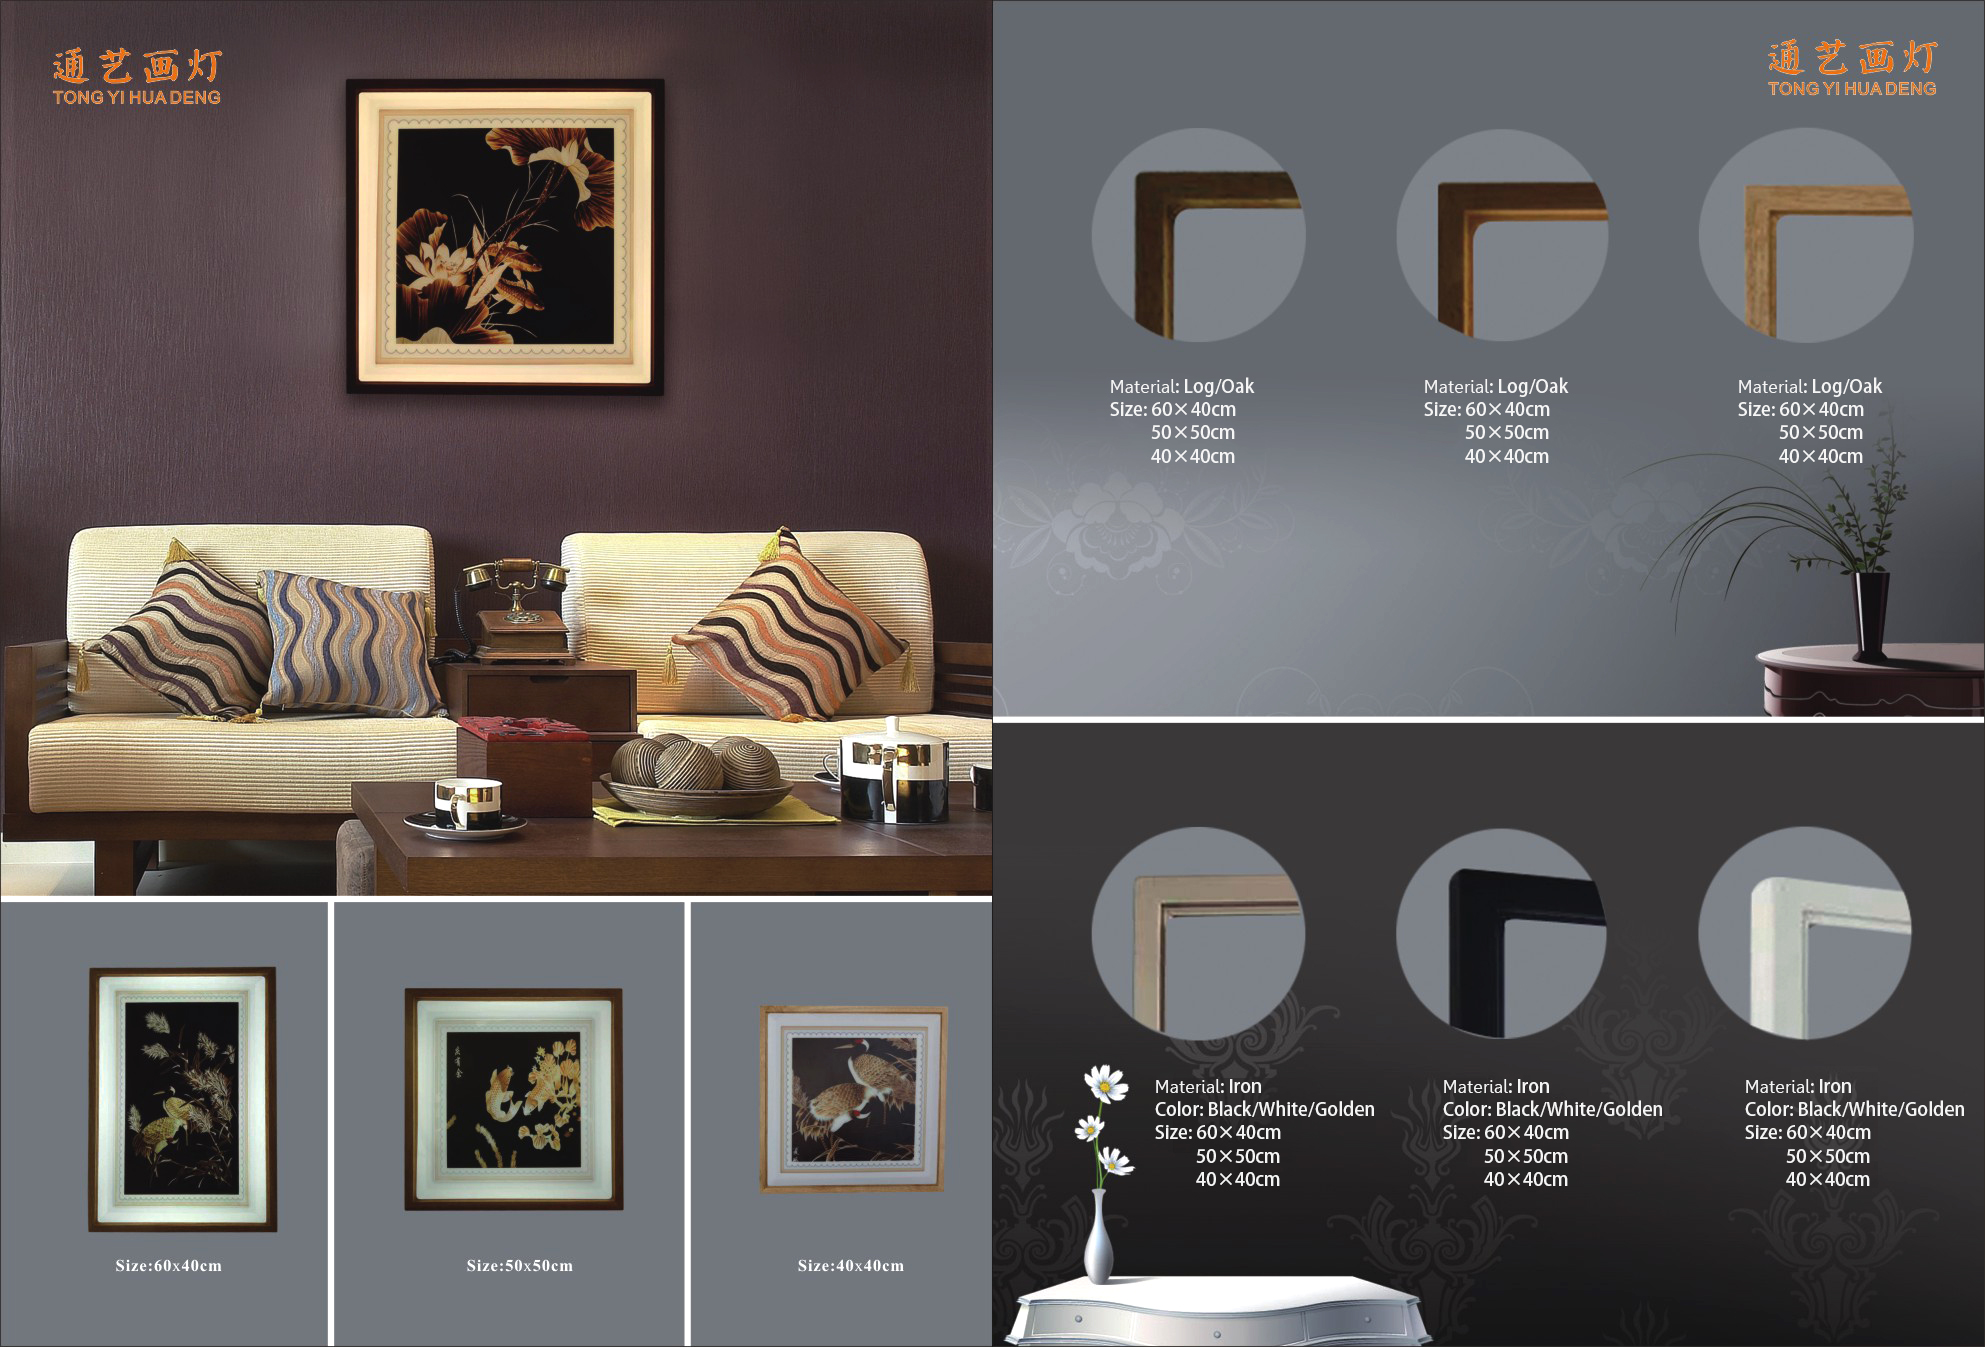 Solid Wood Artistic Fresco Lamp; Horizon-lights